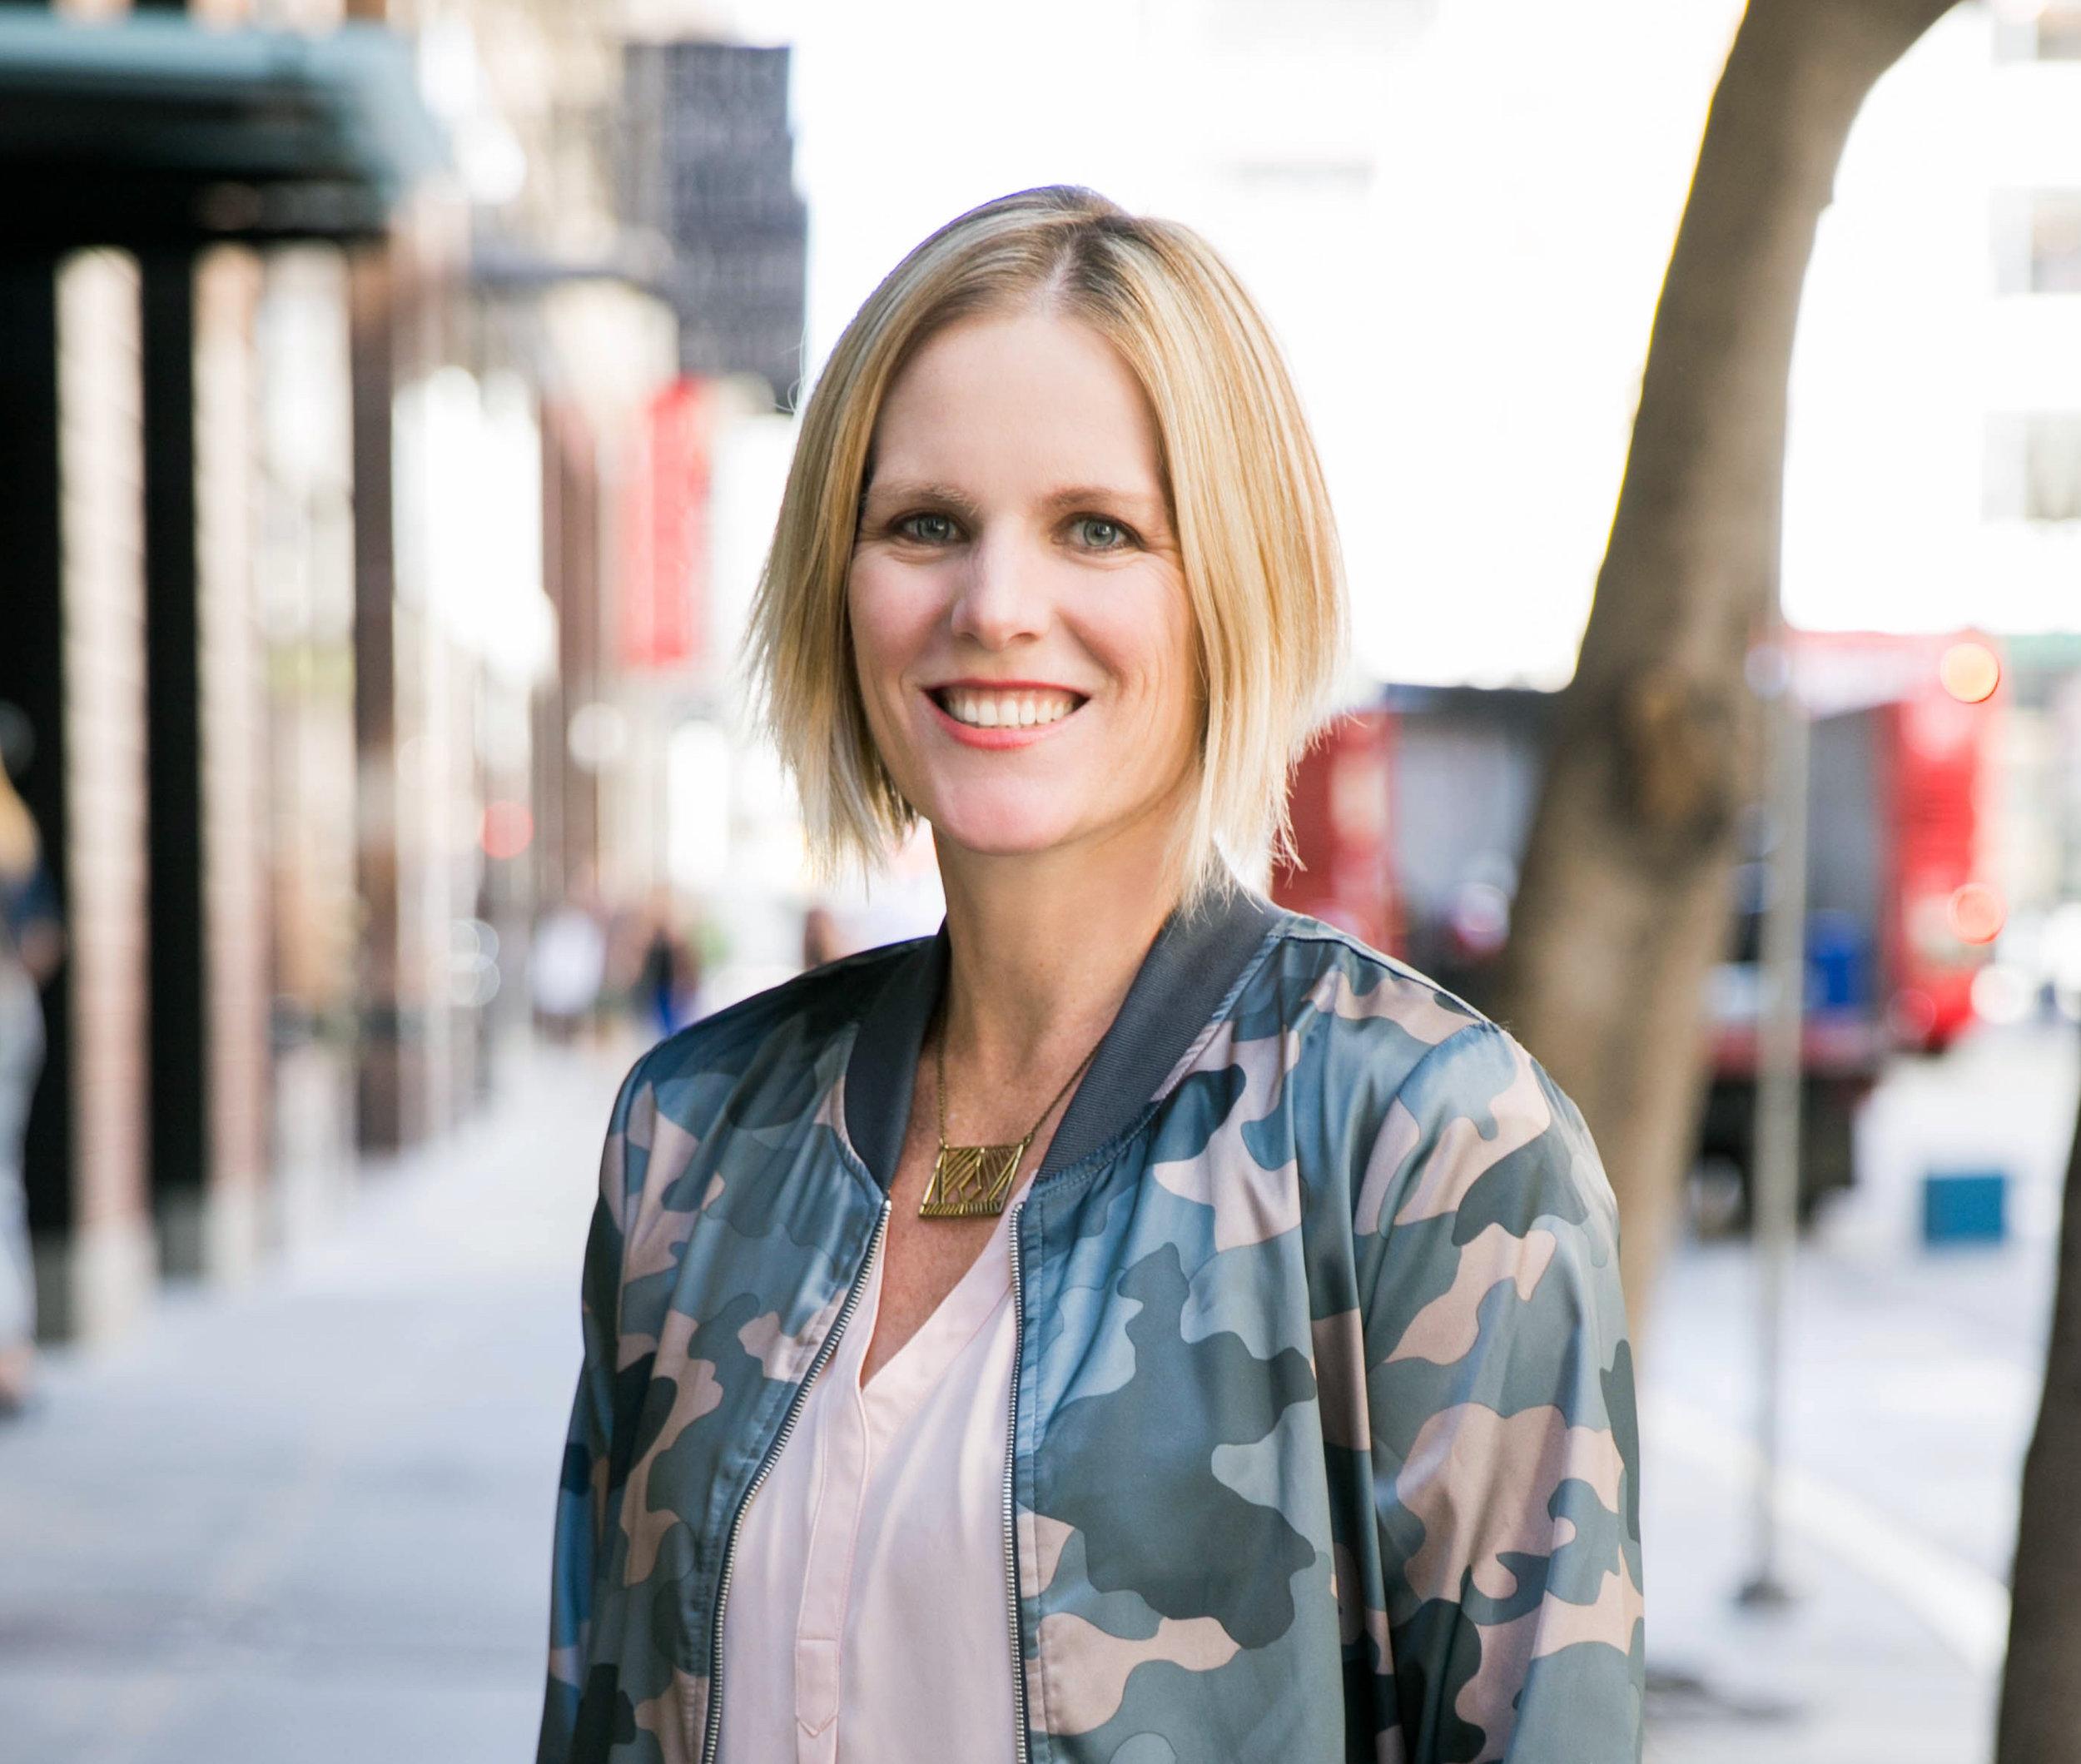 Lindsay Riddell - Speaker, Media and Content Strategist for Hotwire Global